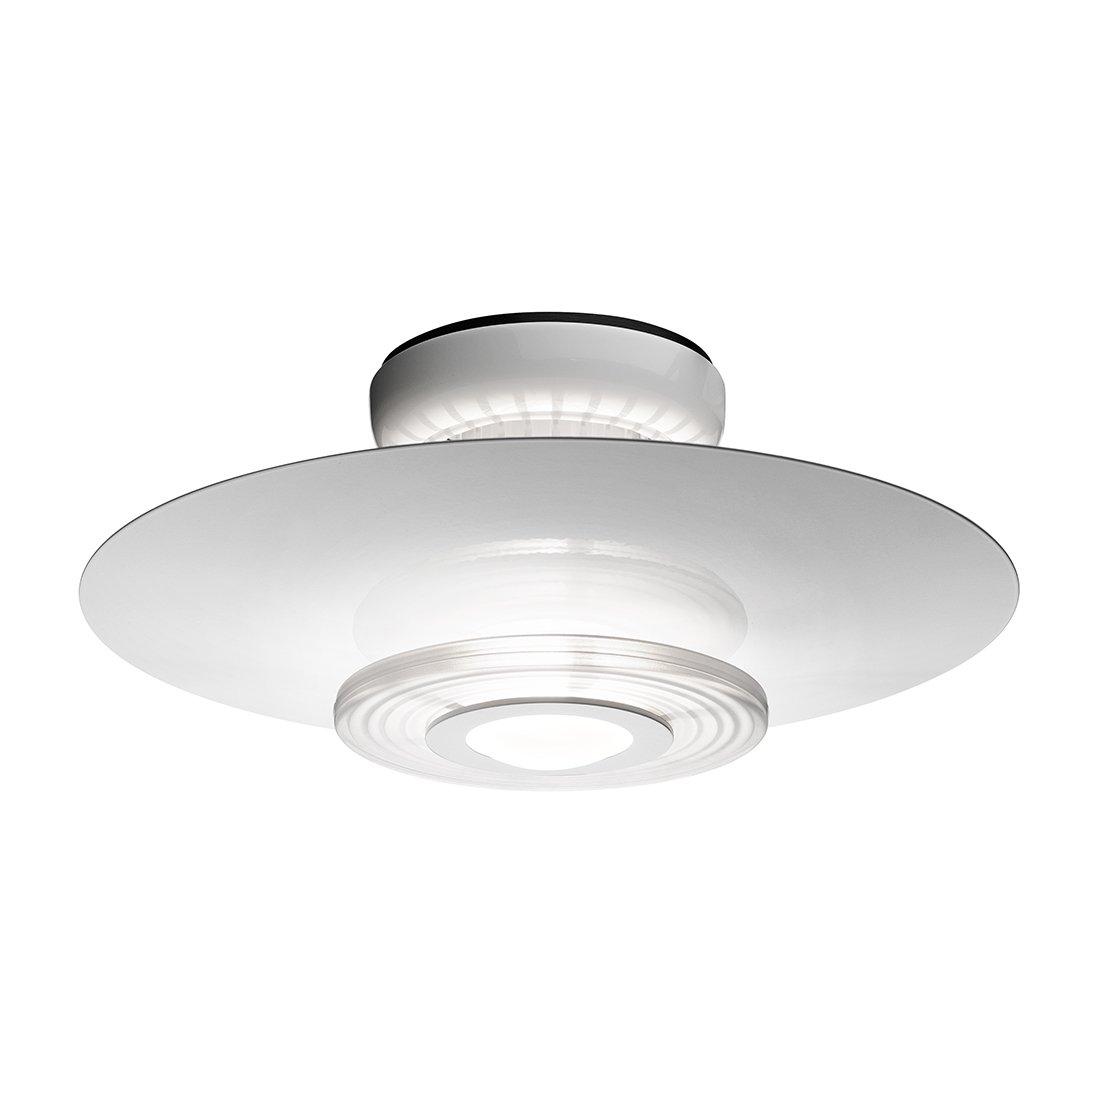 FLOS Moni 2 Plafondlamp Wit